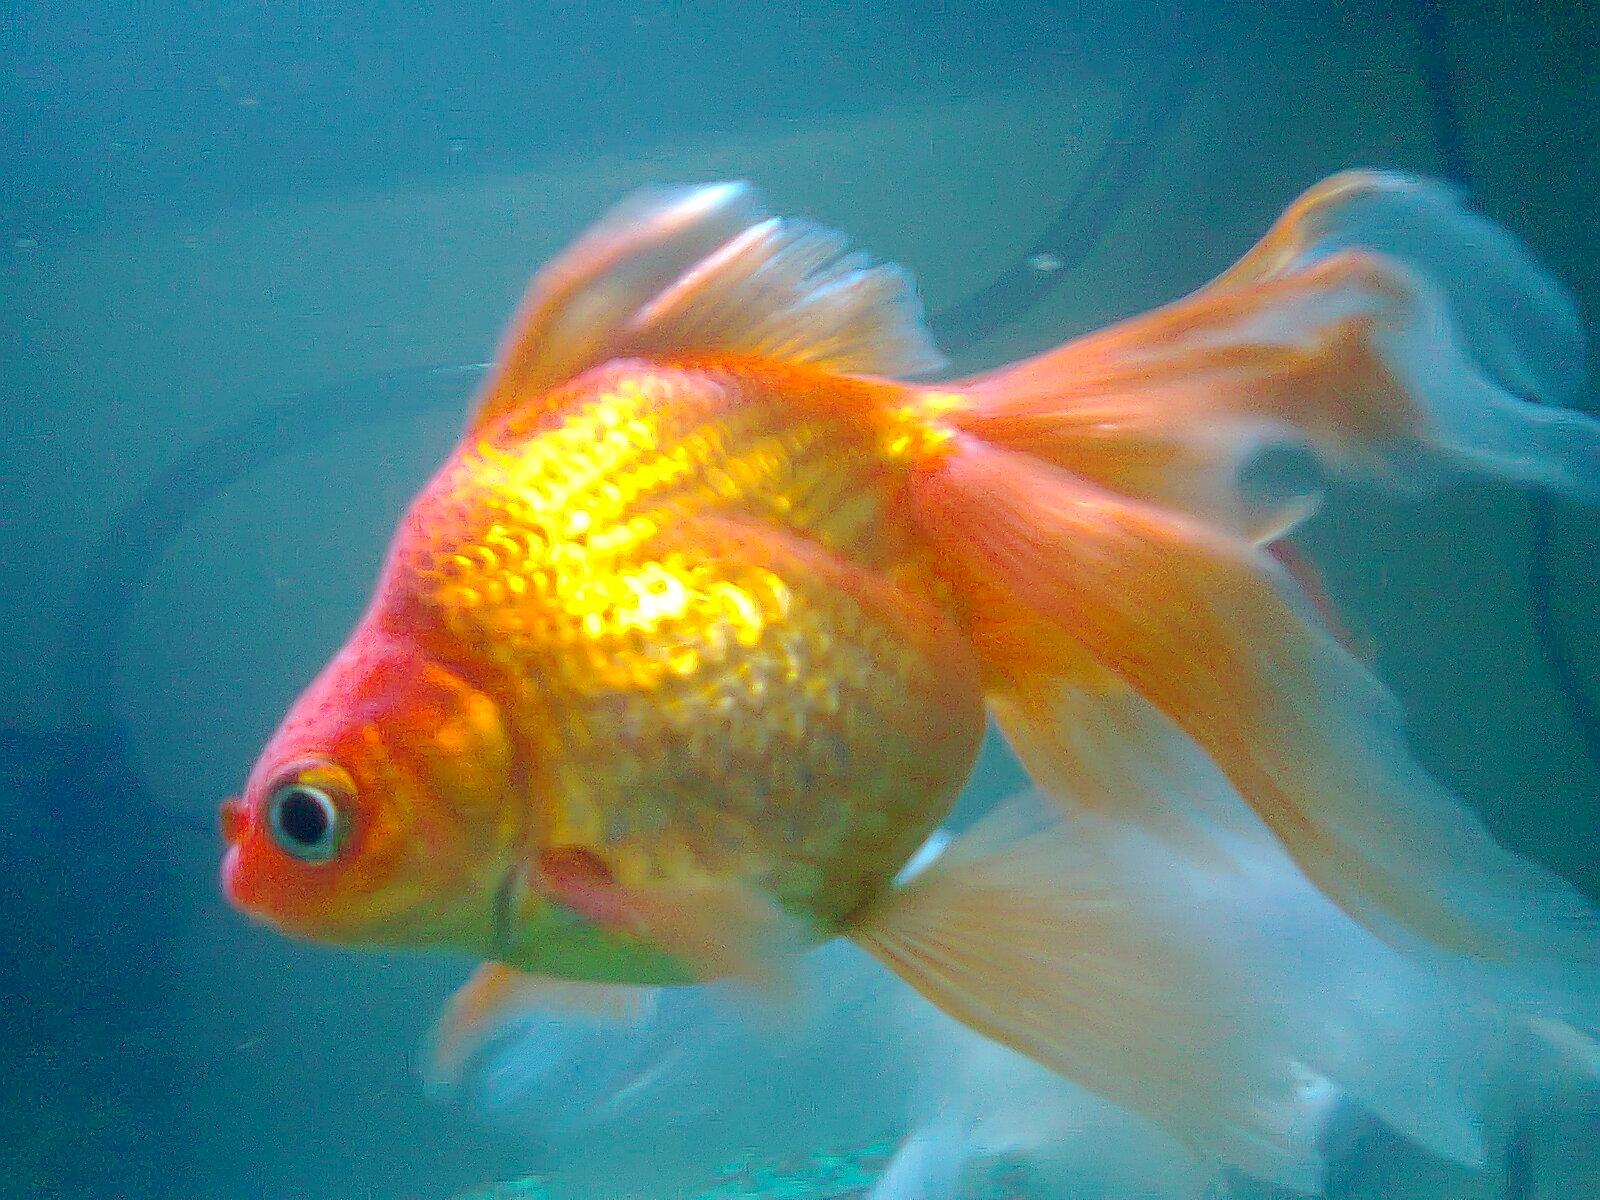 Pin poissons 37 on pinterest for Poisson rouge japonais